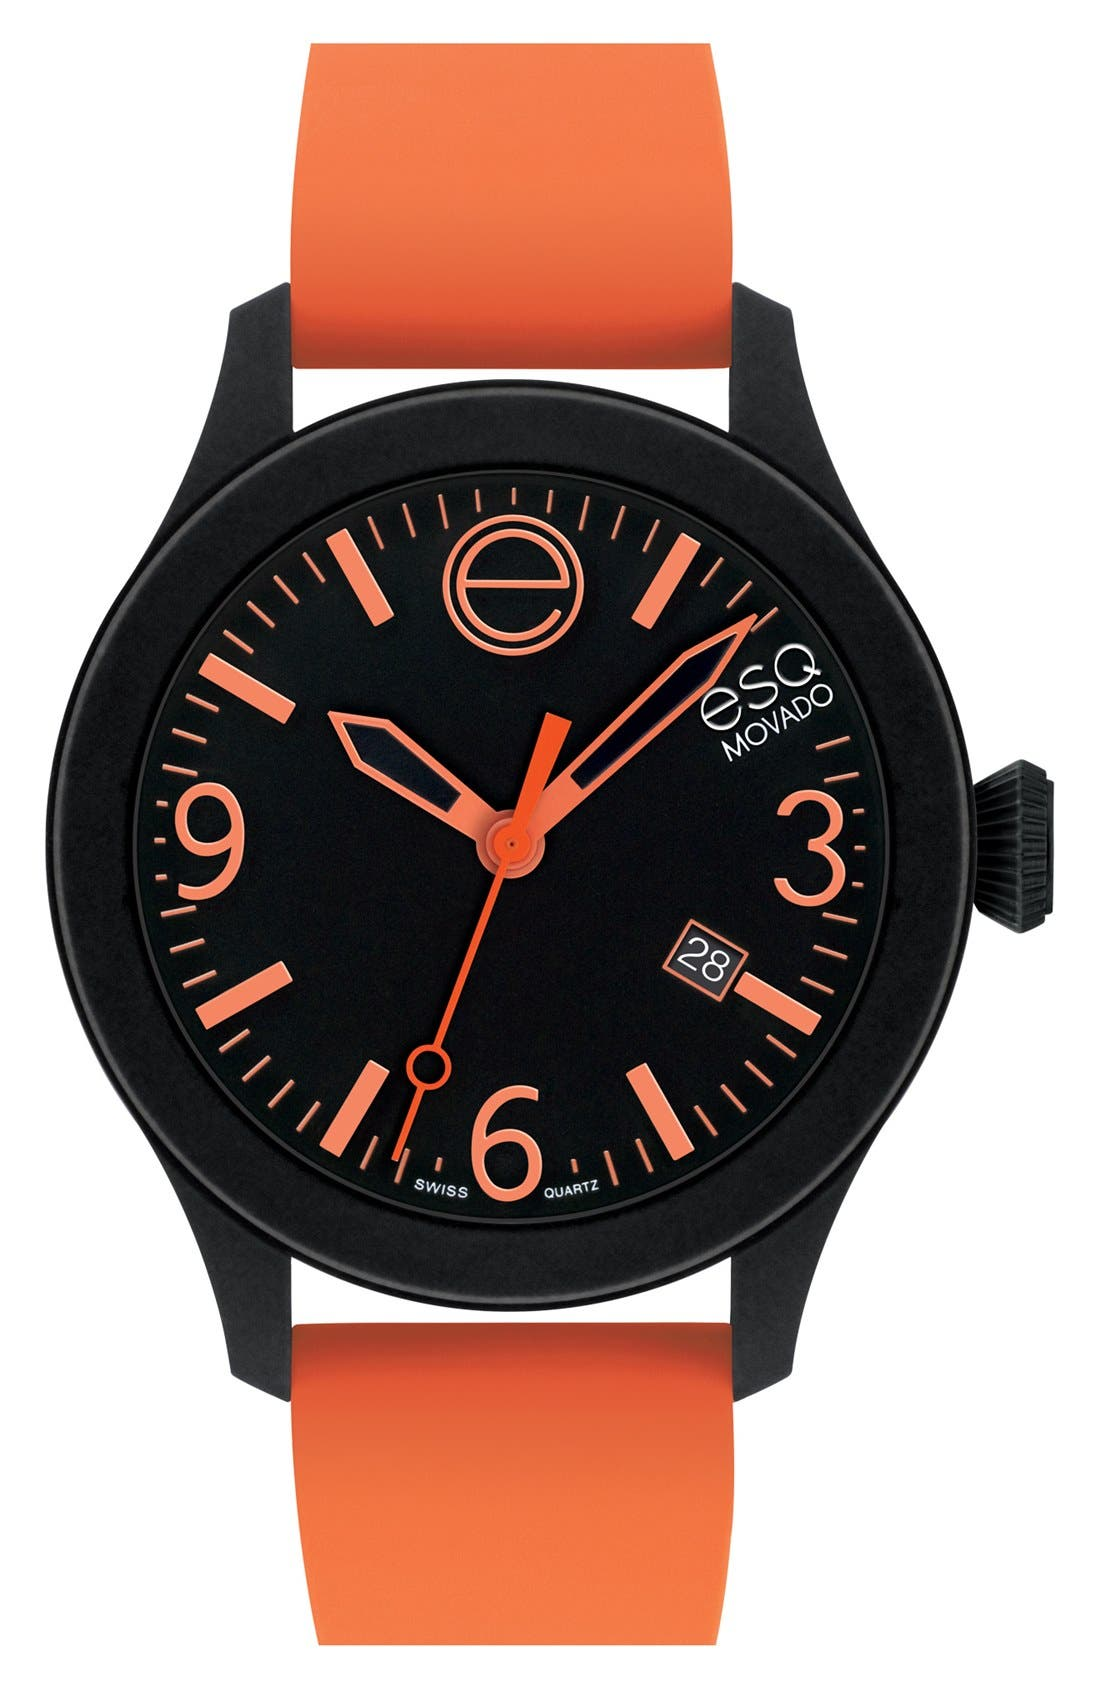 Main Image - ESQ Movado 'One' Silicone Strap Watch, 42mm